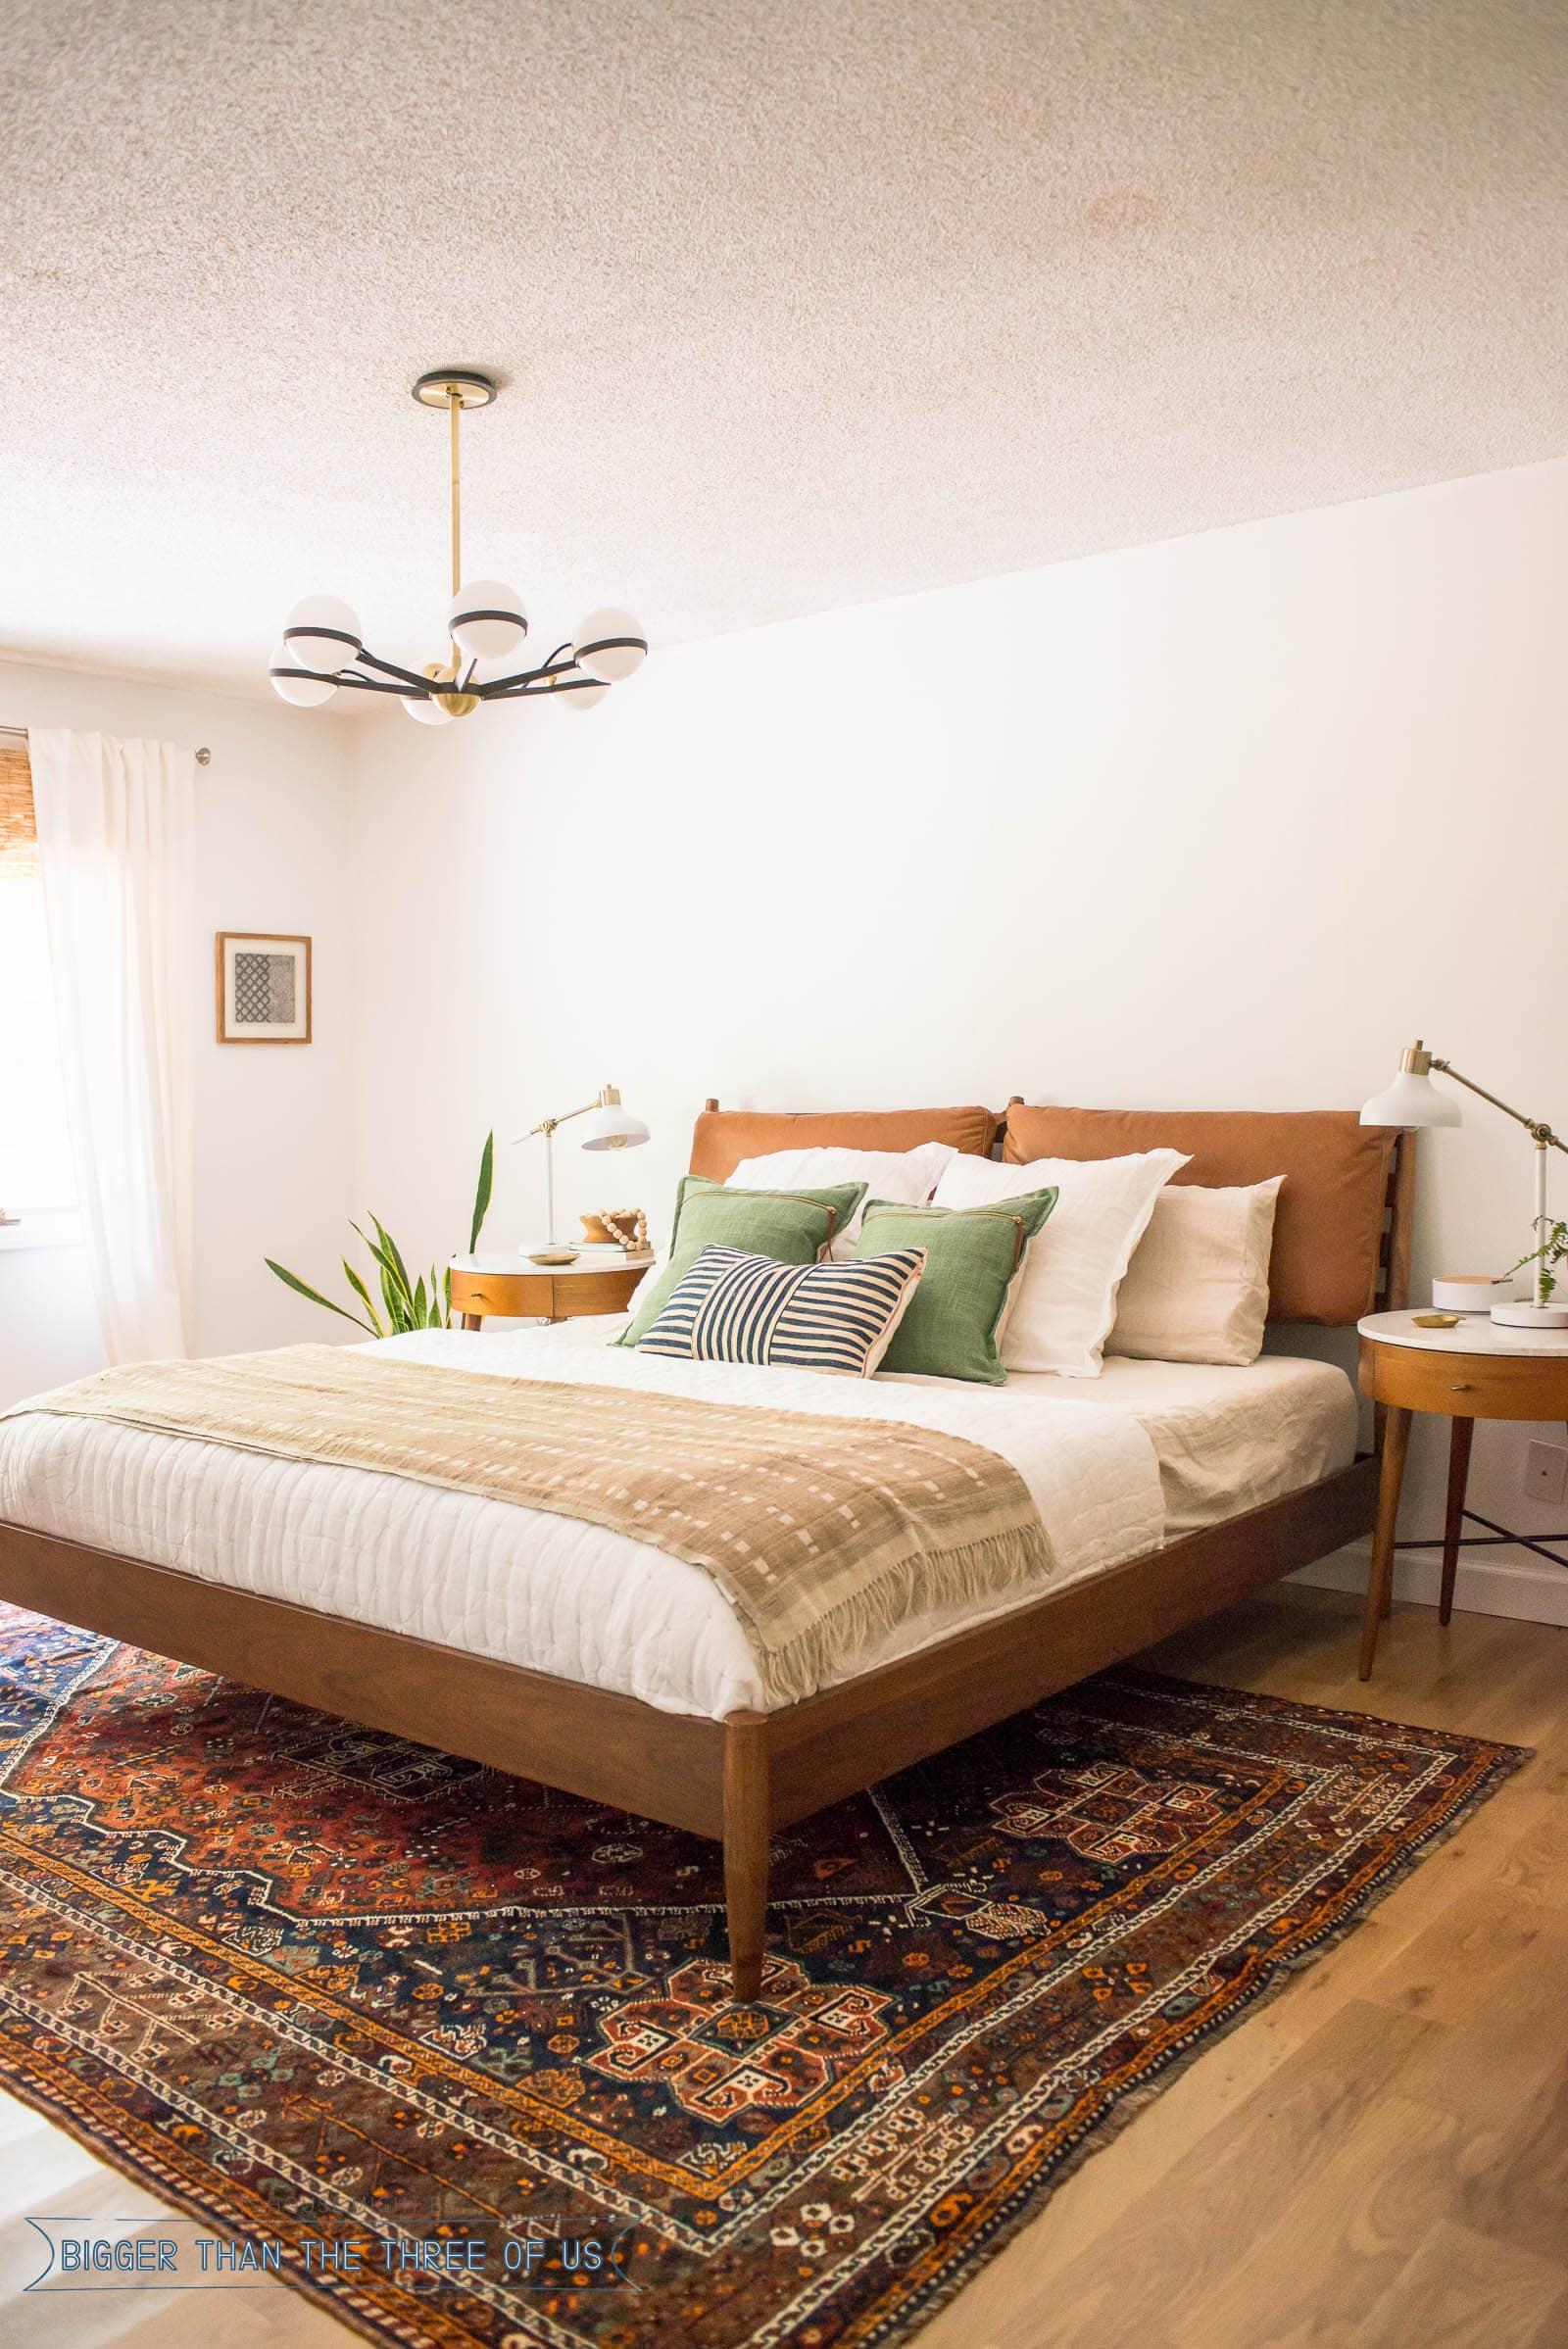 Mid Century Modern Bedroom Bigger Than The Three Of Us